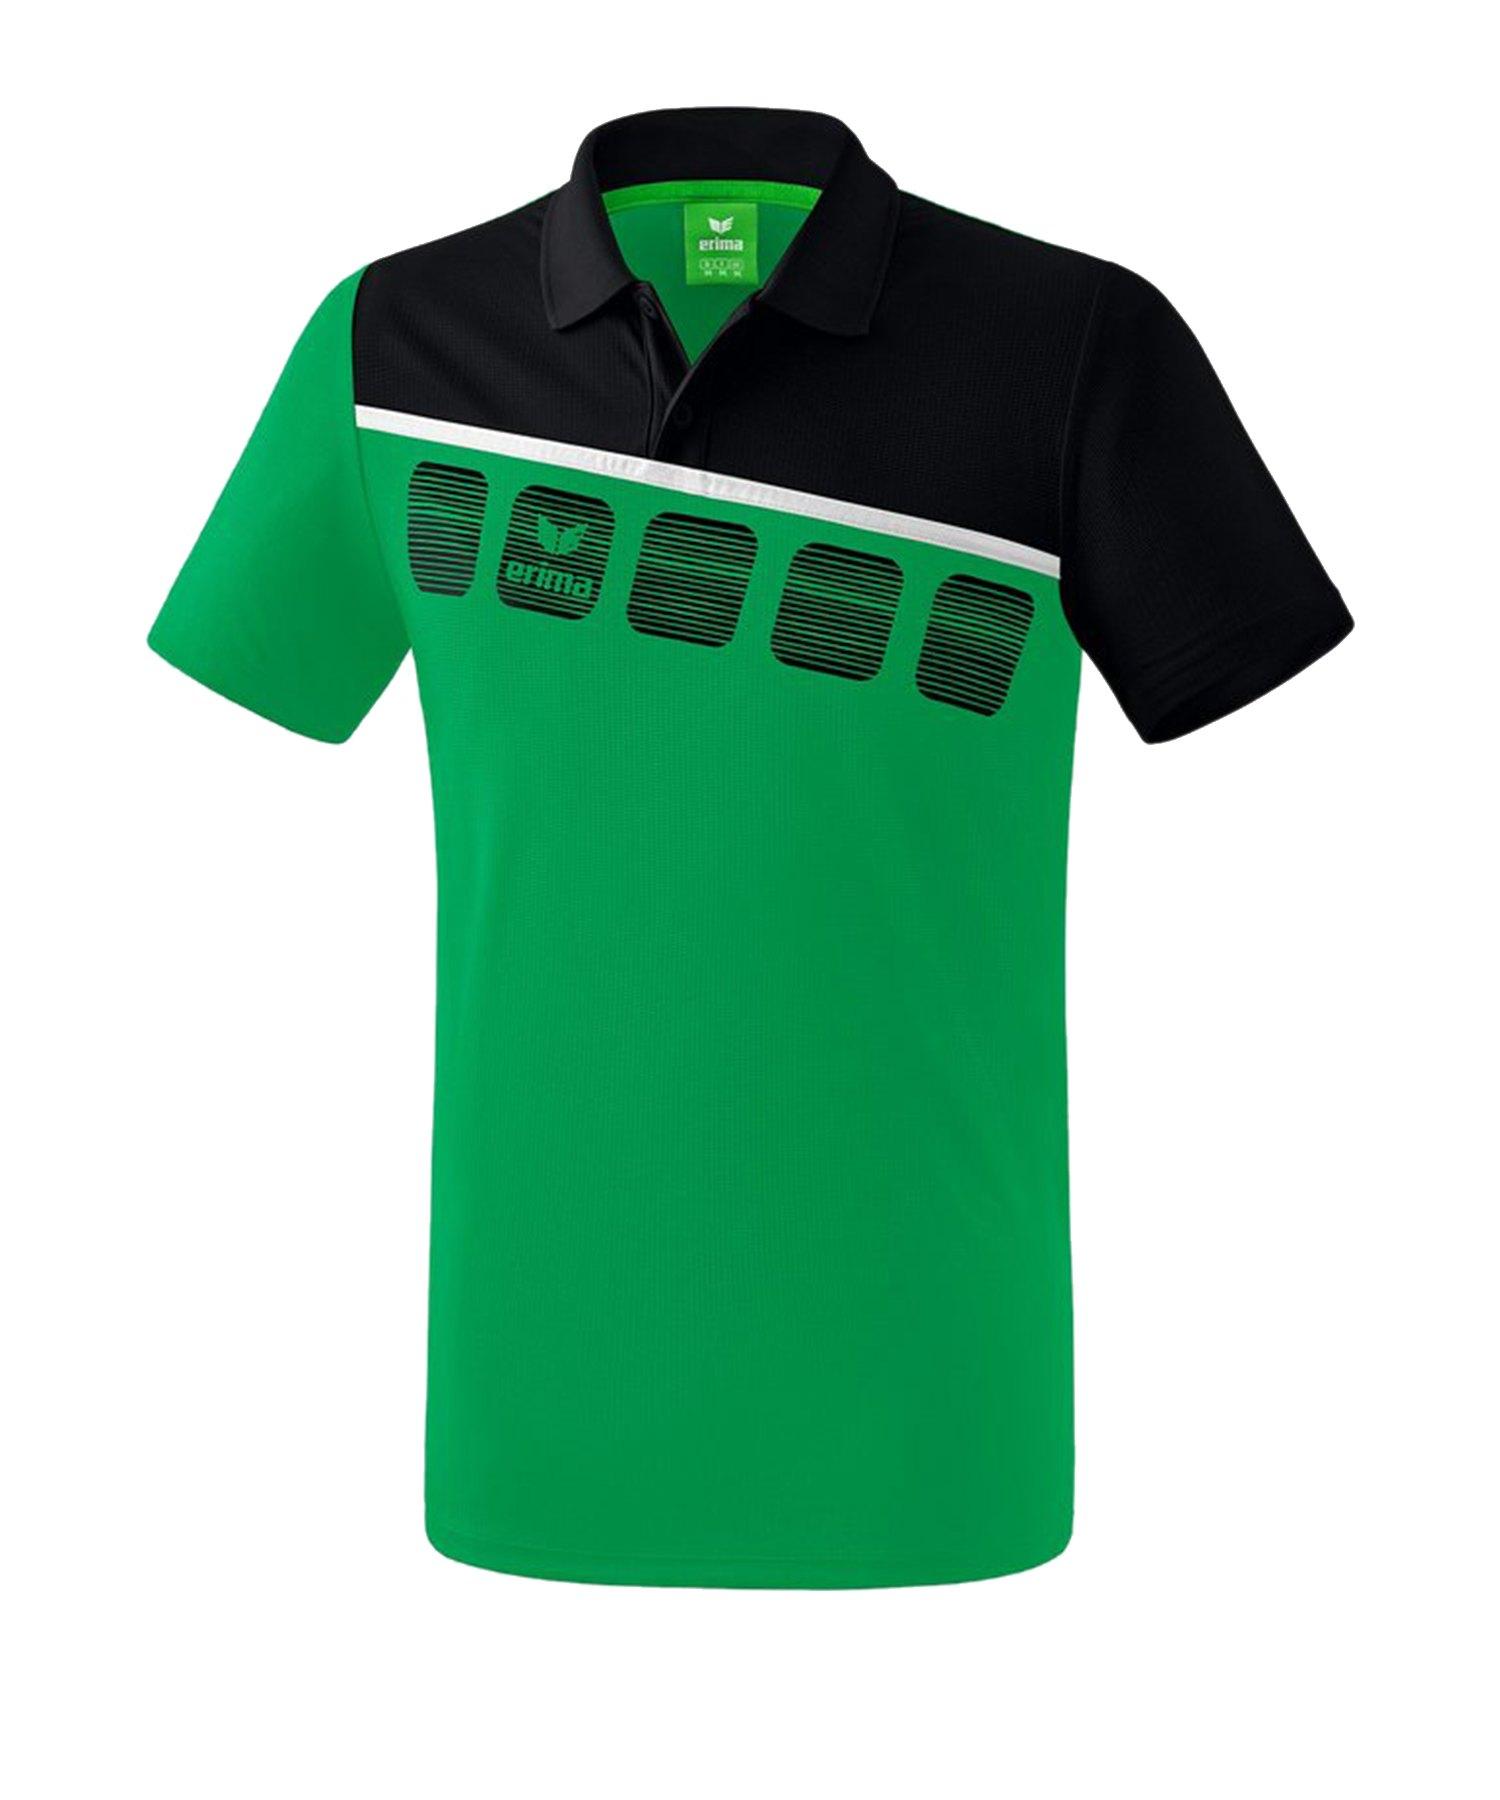 Erima 5-C Poloshirt Kids Grün Schwarz - Gruen